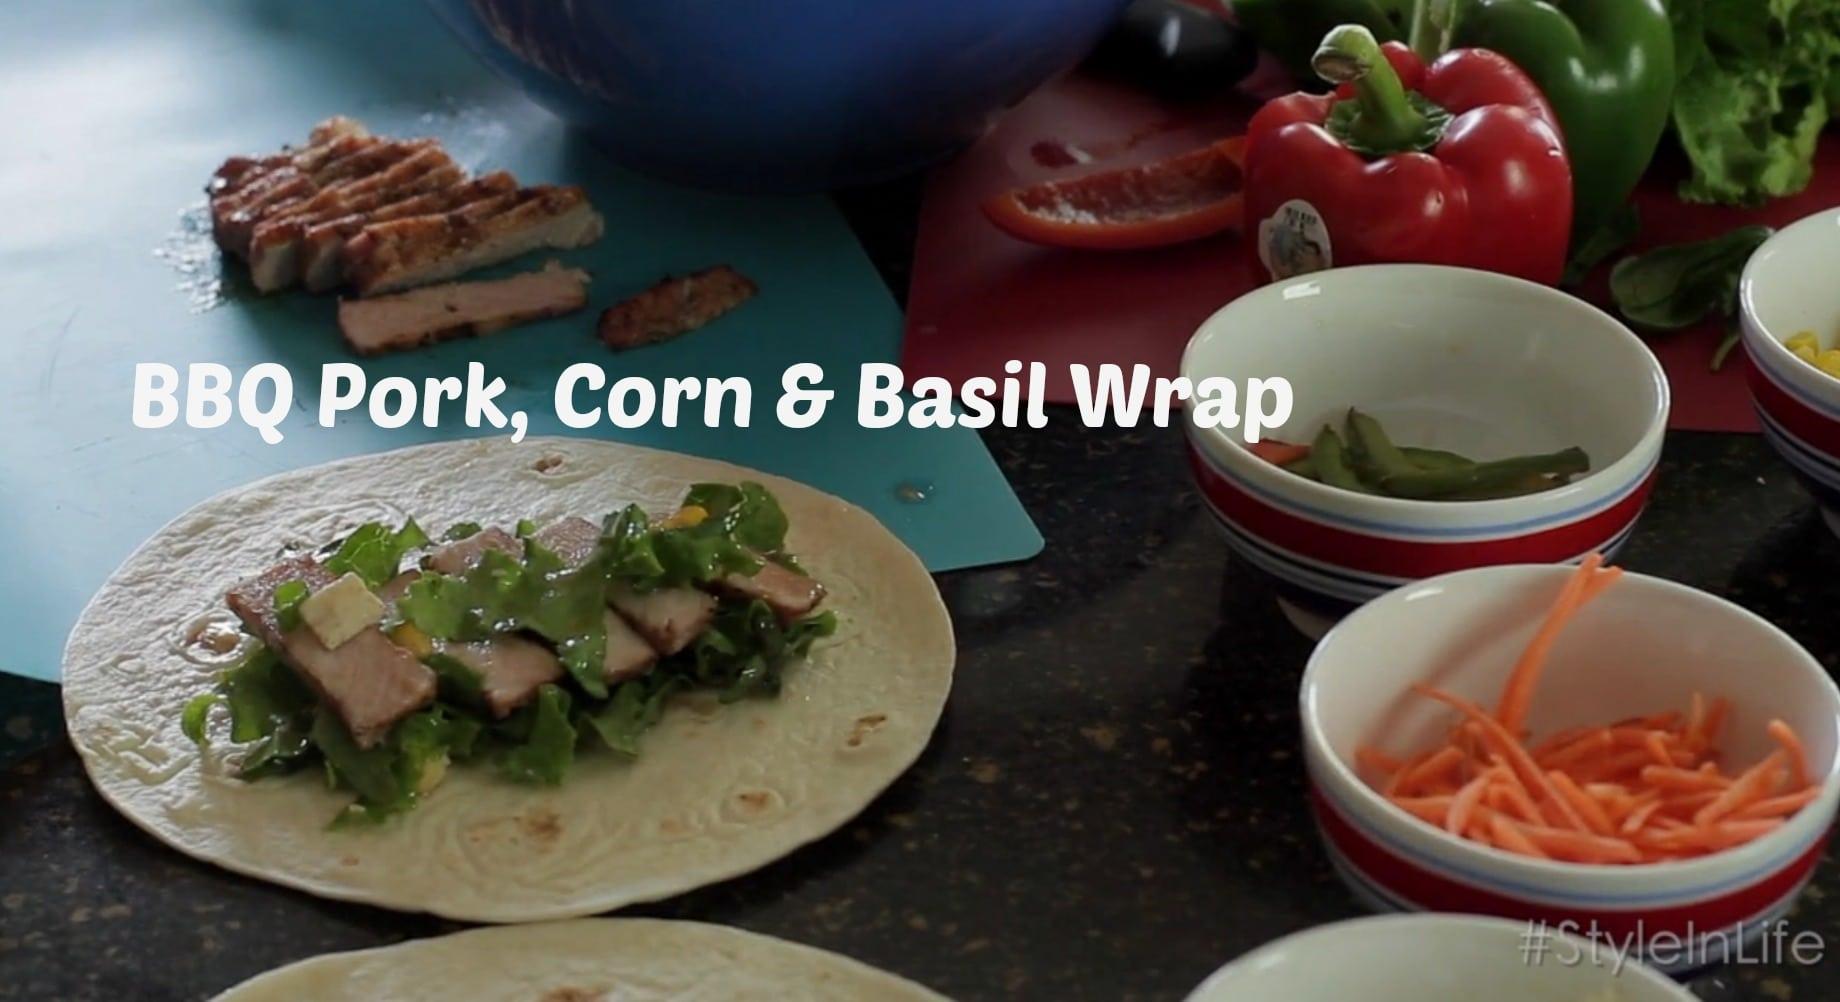 Pork BBQ Corn and Basil Wrap